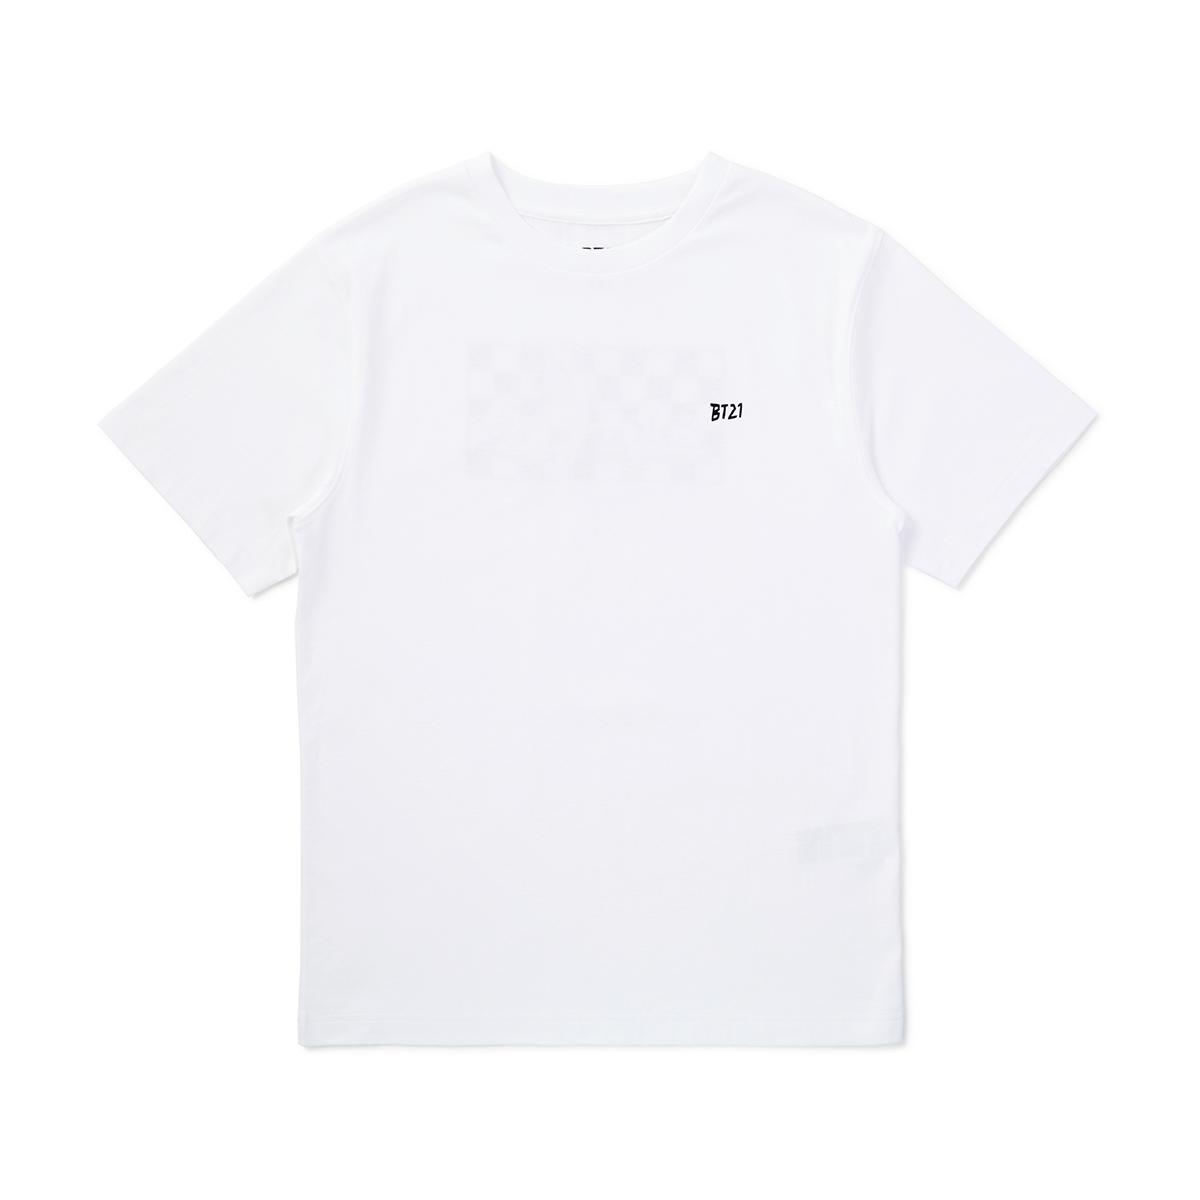 BT21 화이트 바이트 스퀘어 그래픽 반팔 티셔츠